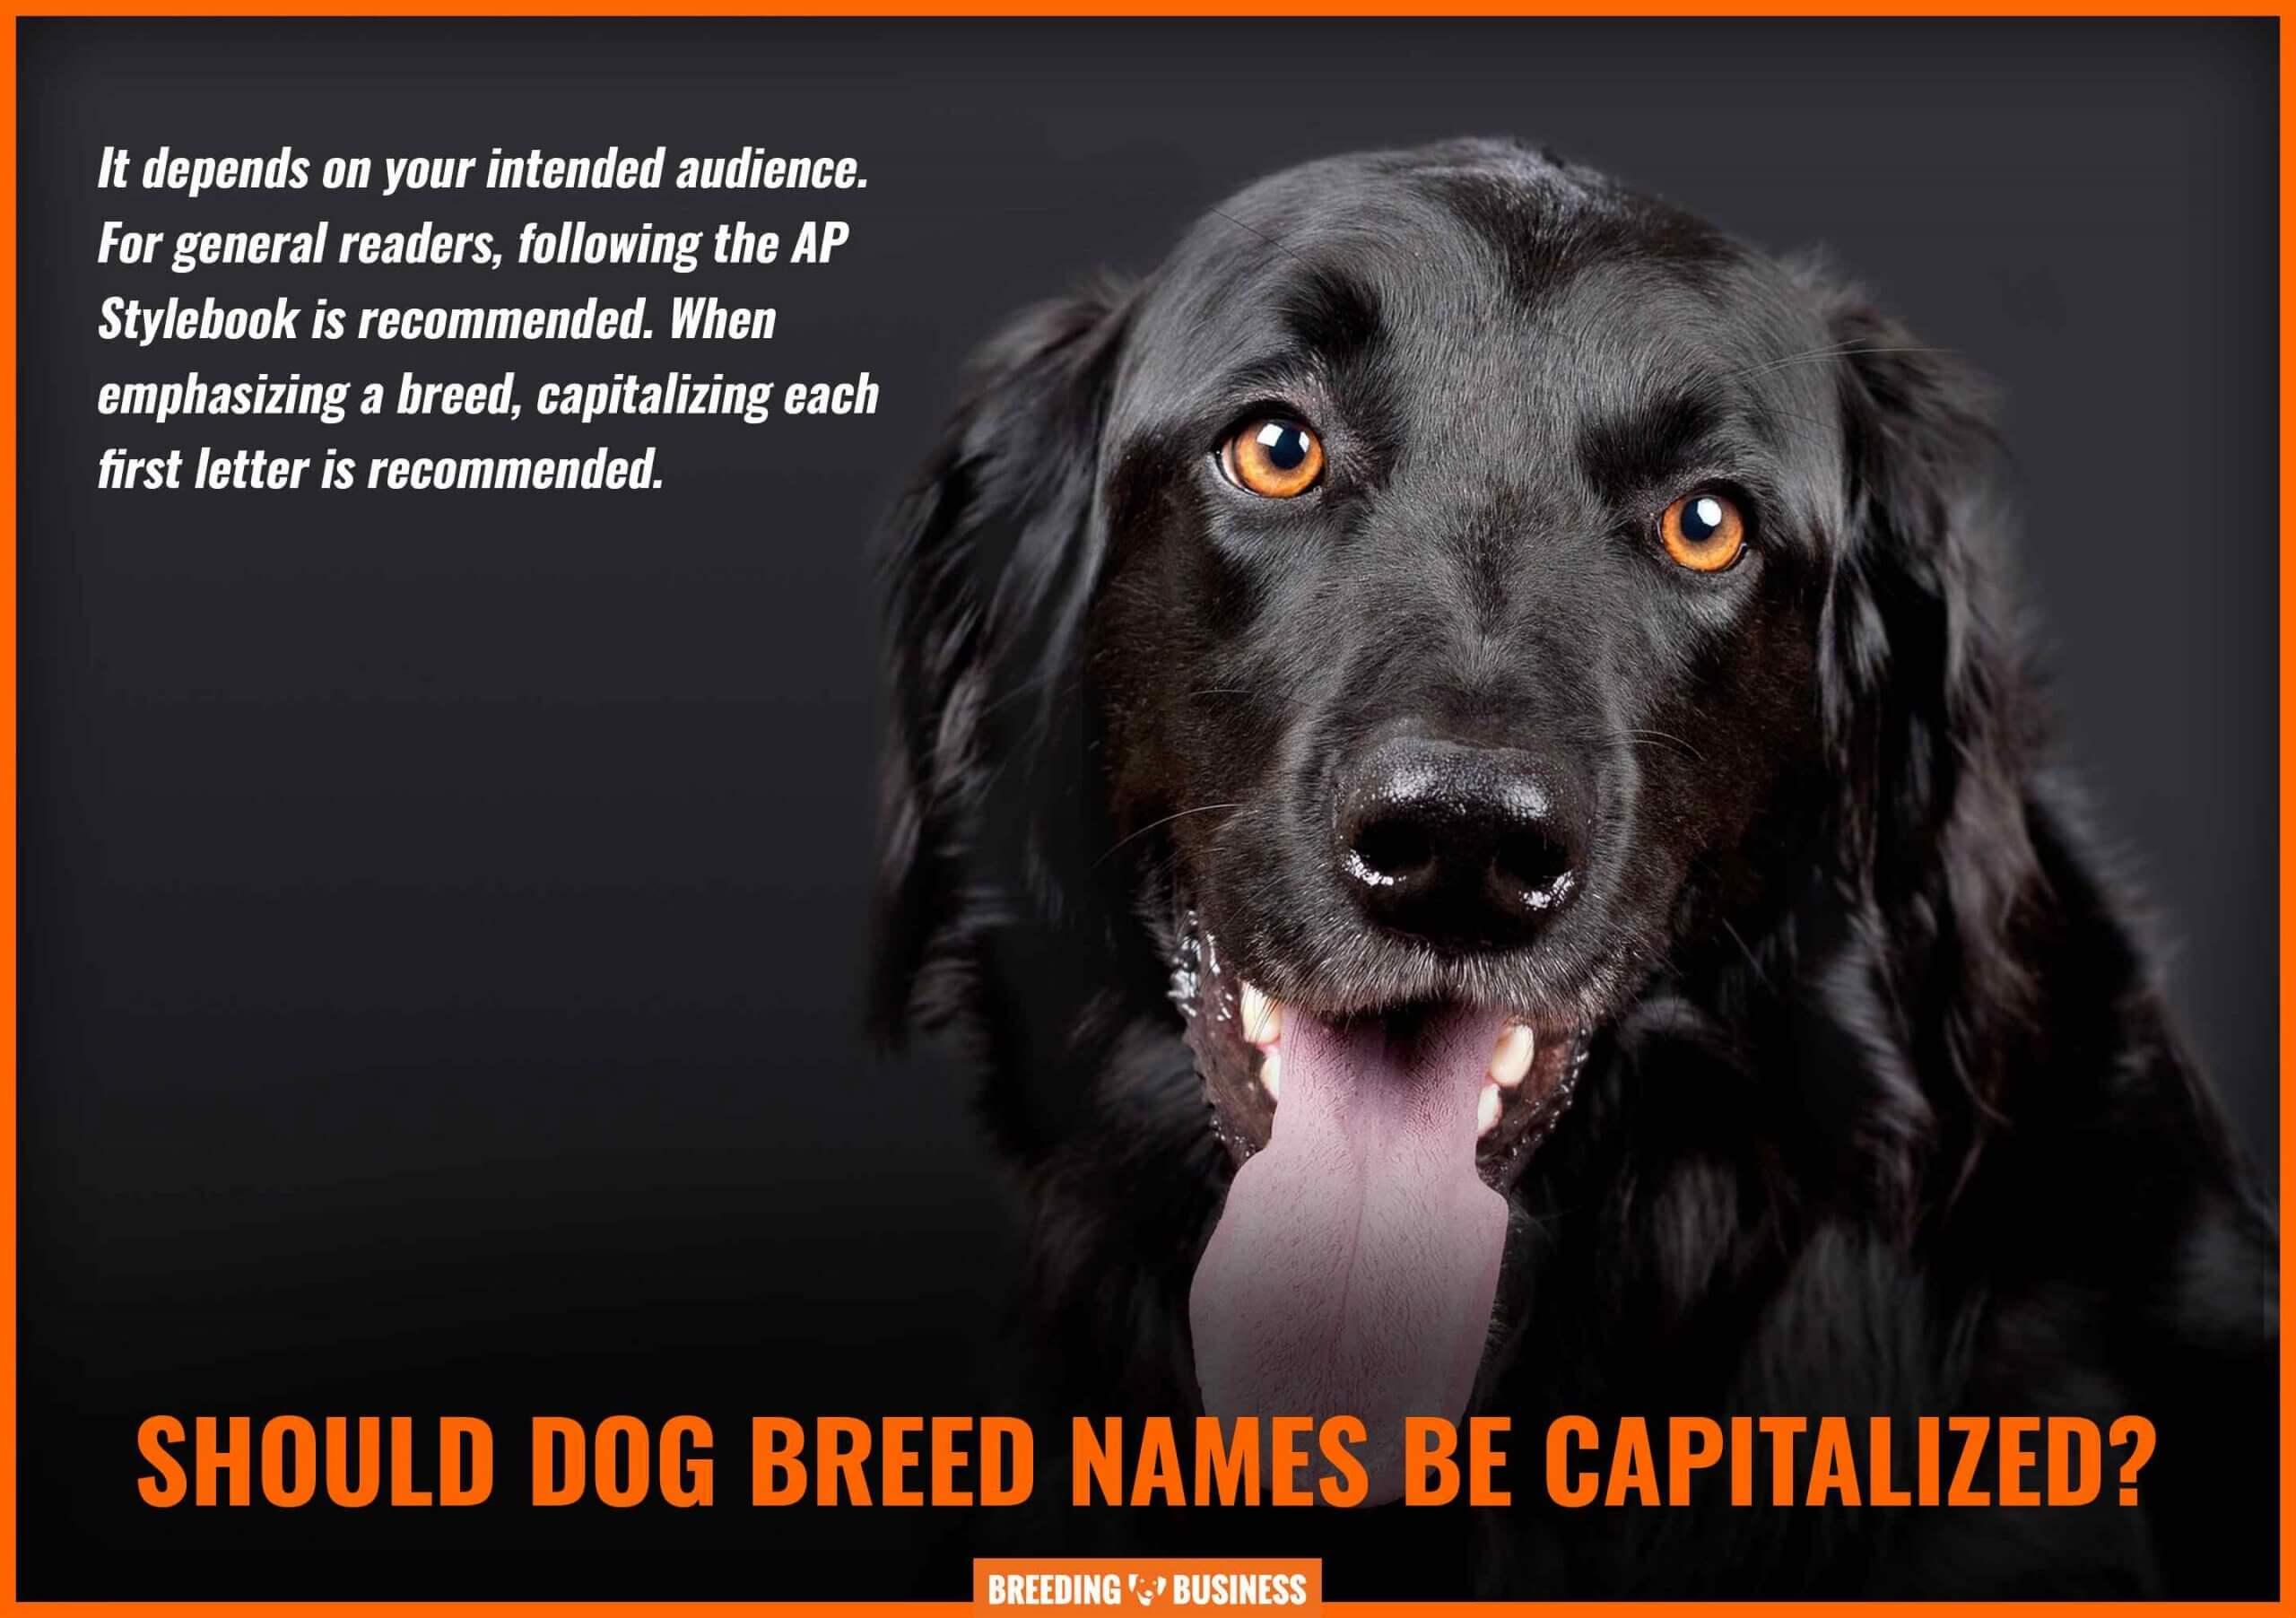 capitalization of dog breed names